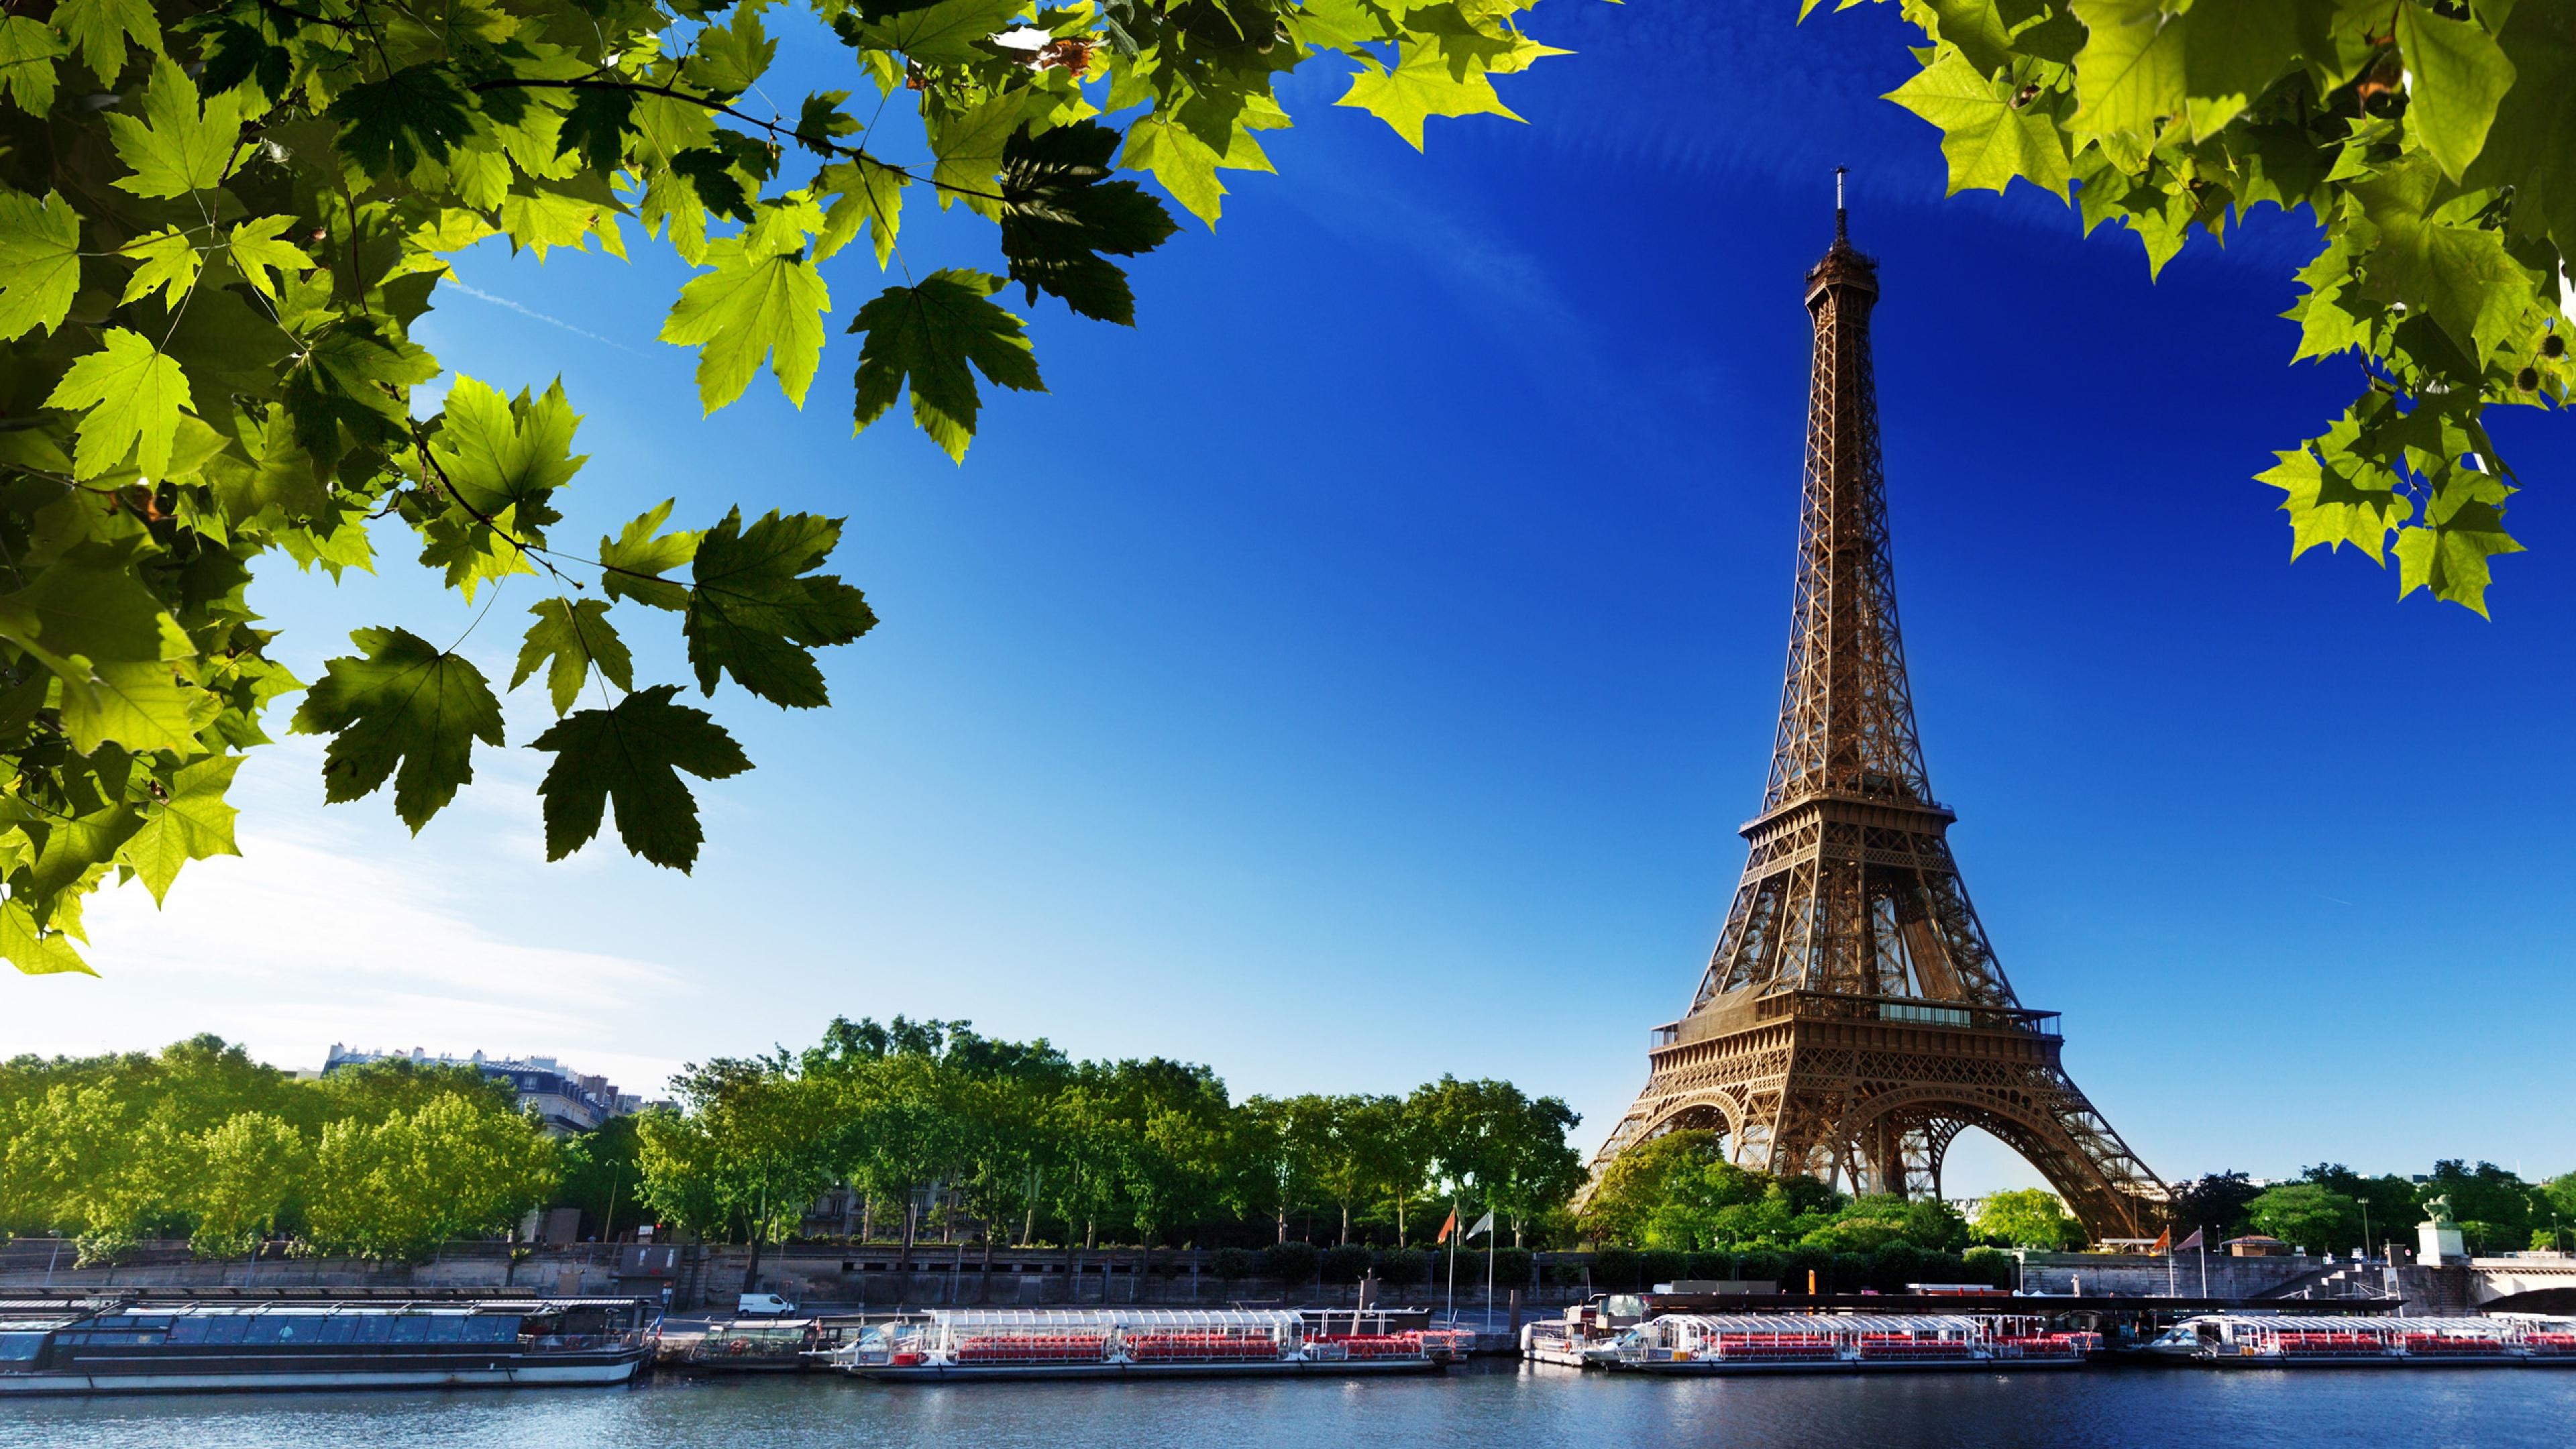 Eiffel Tower Paris 4k Hd World 4k Wallpapers Images